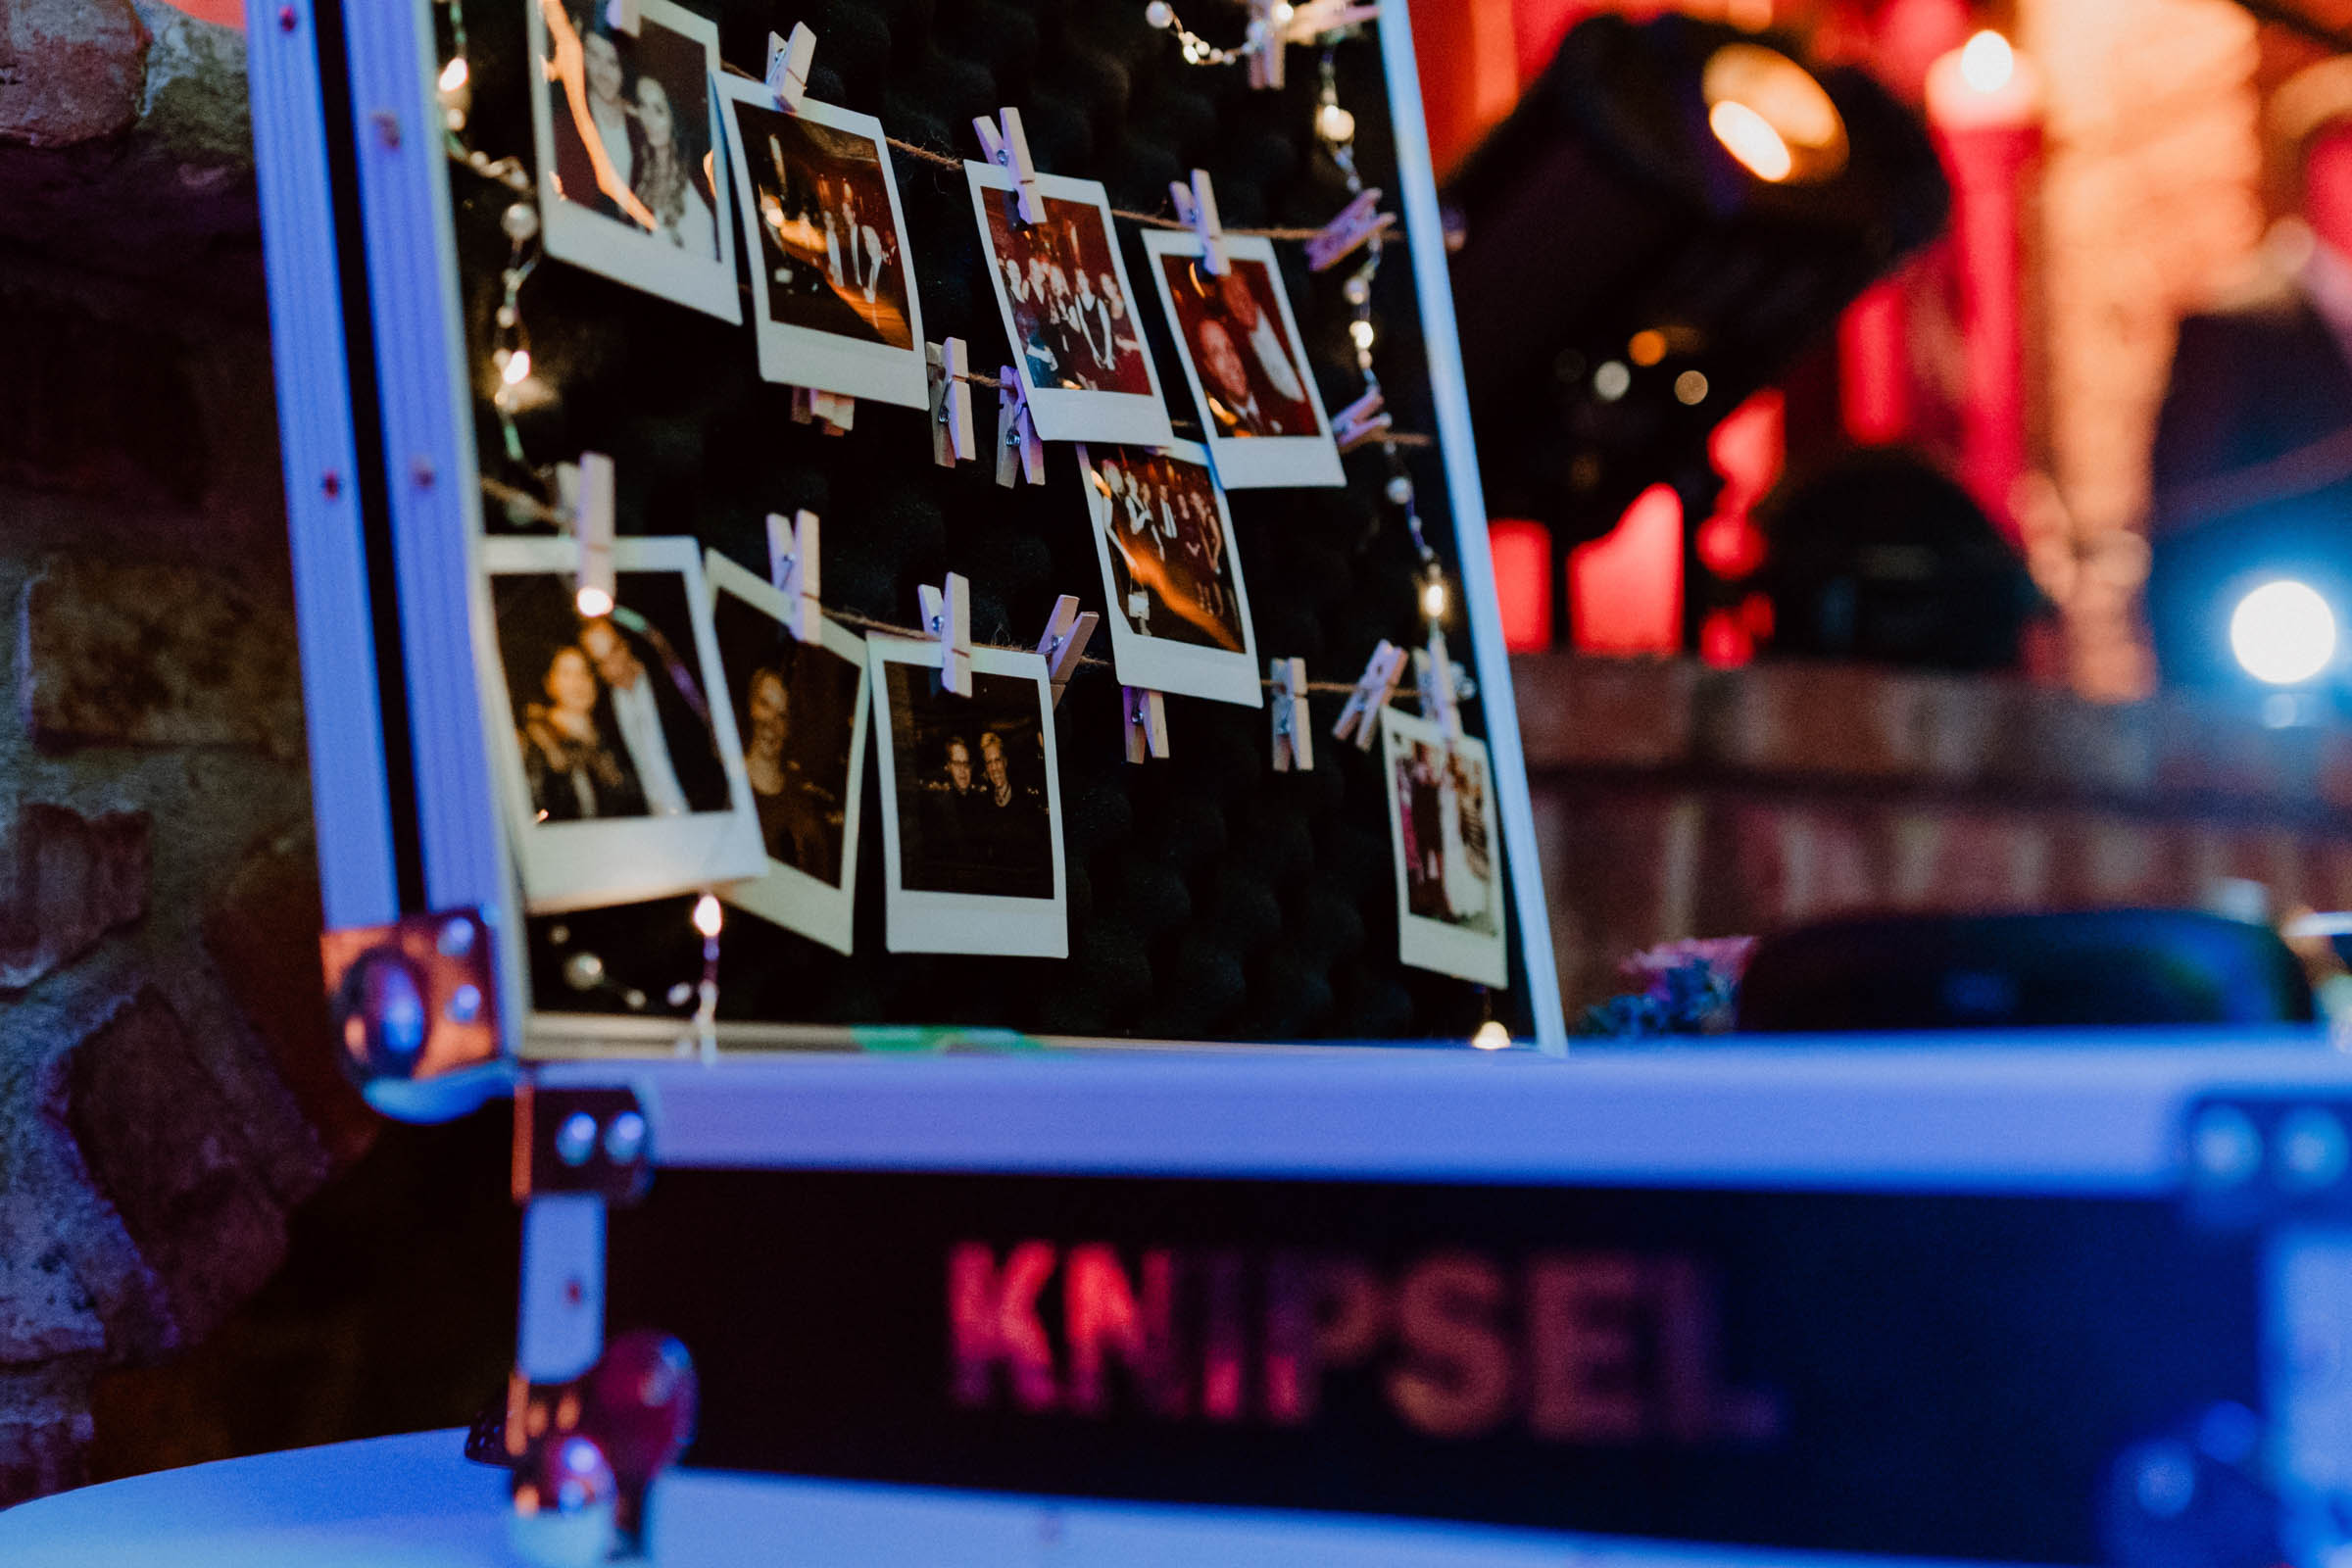 Knipsel Polaroid Koffer - Kamera - Mieten - Hochzeit - Sofortbild - Fotografie